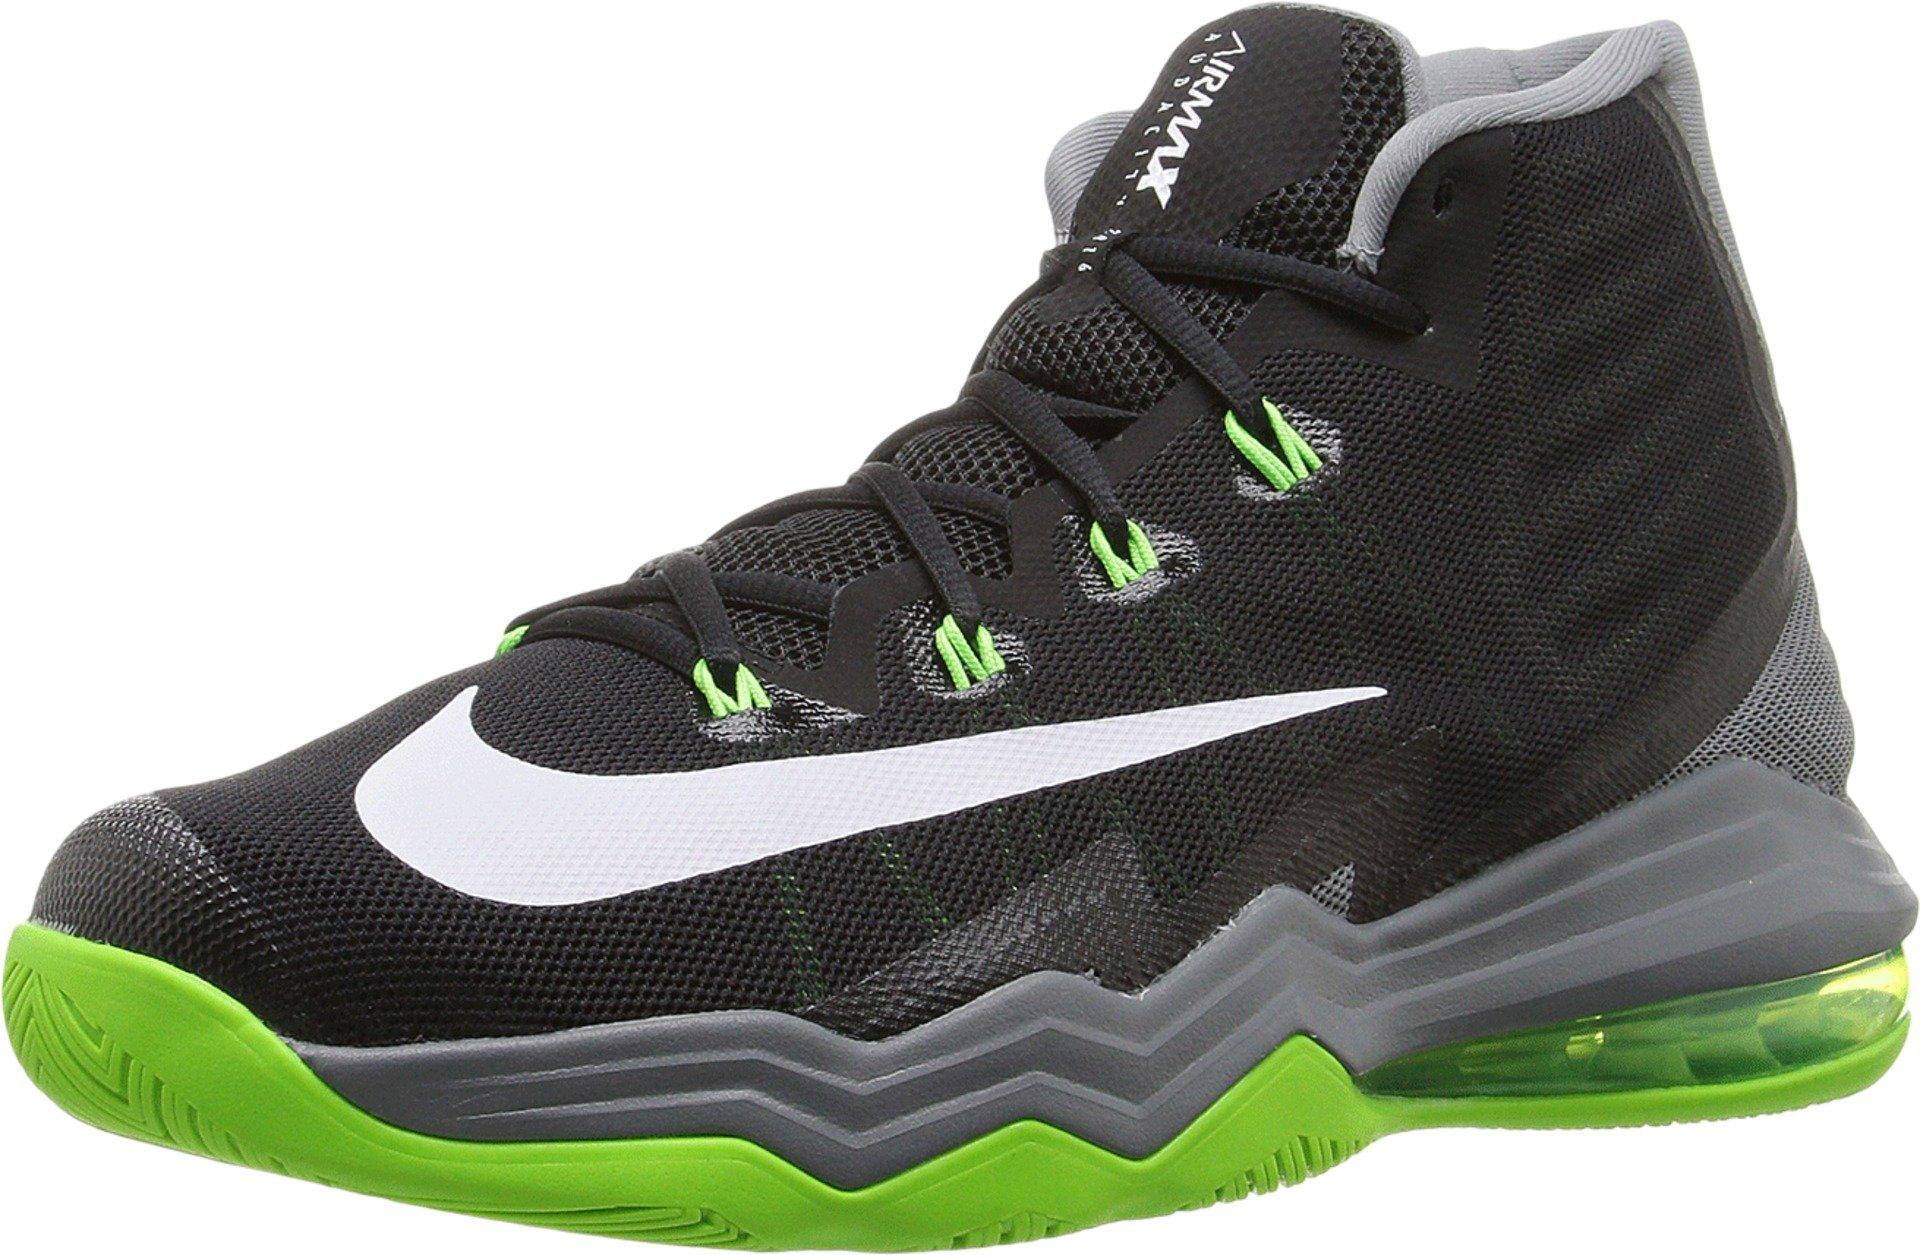 Galleon Nike Air Max Audacity 2016 Men's Shoes BlackWhite